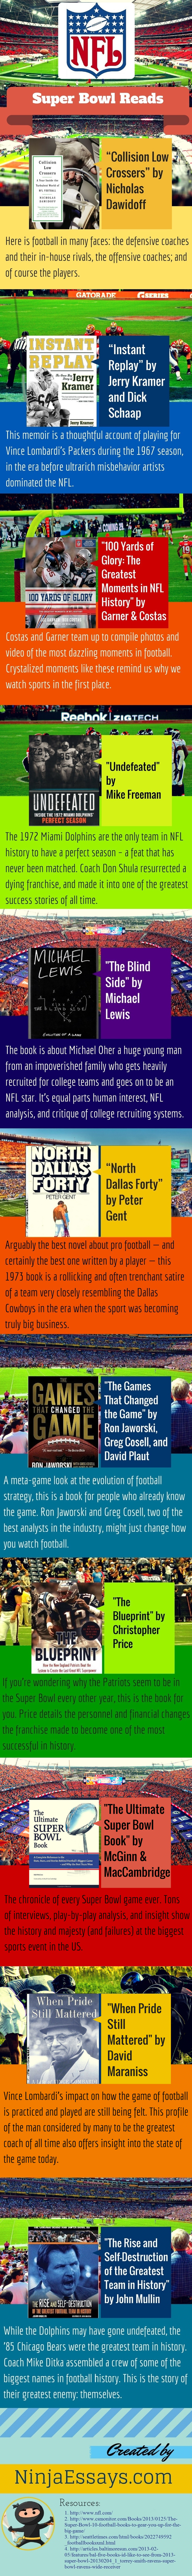 Super Bowl Reads